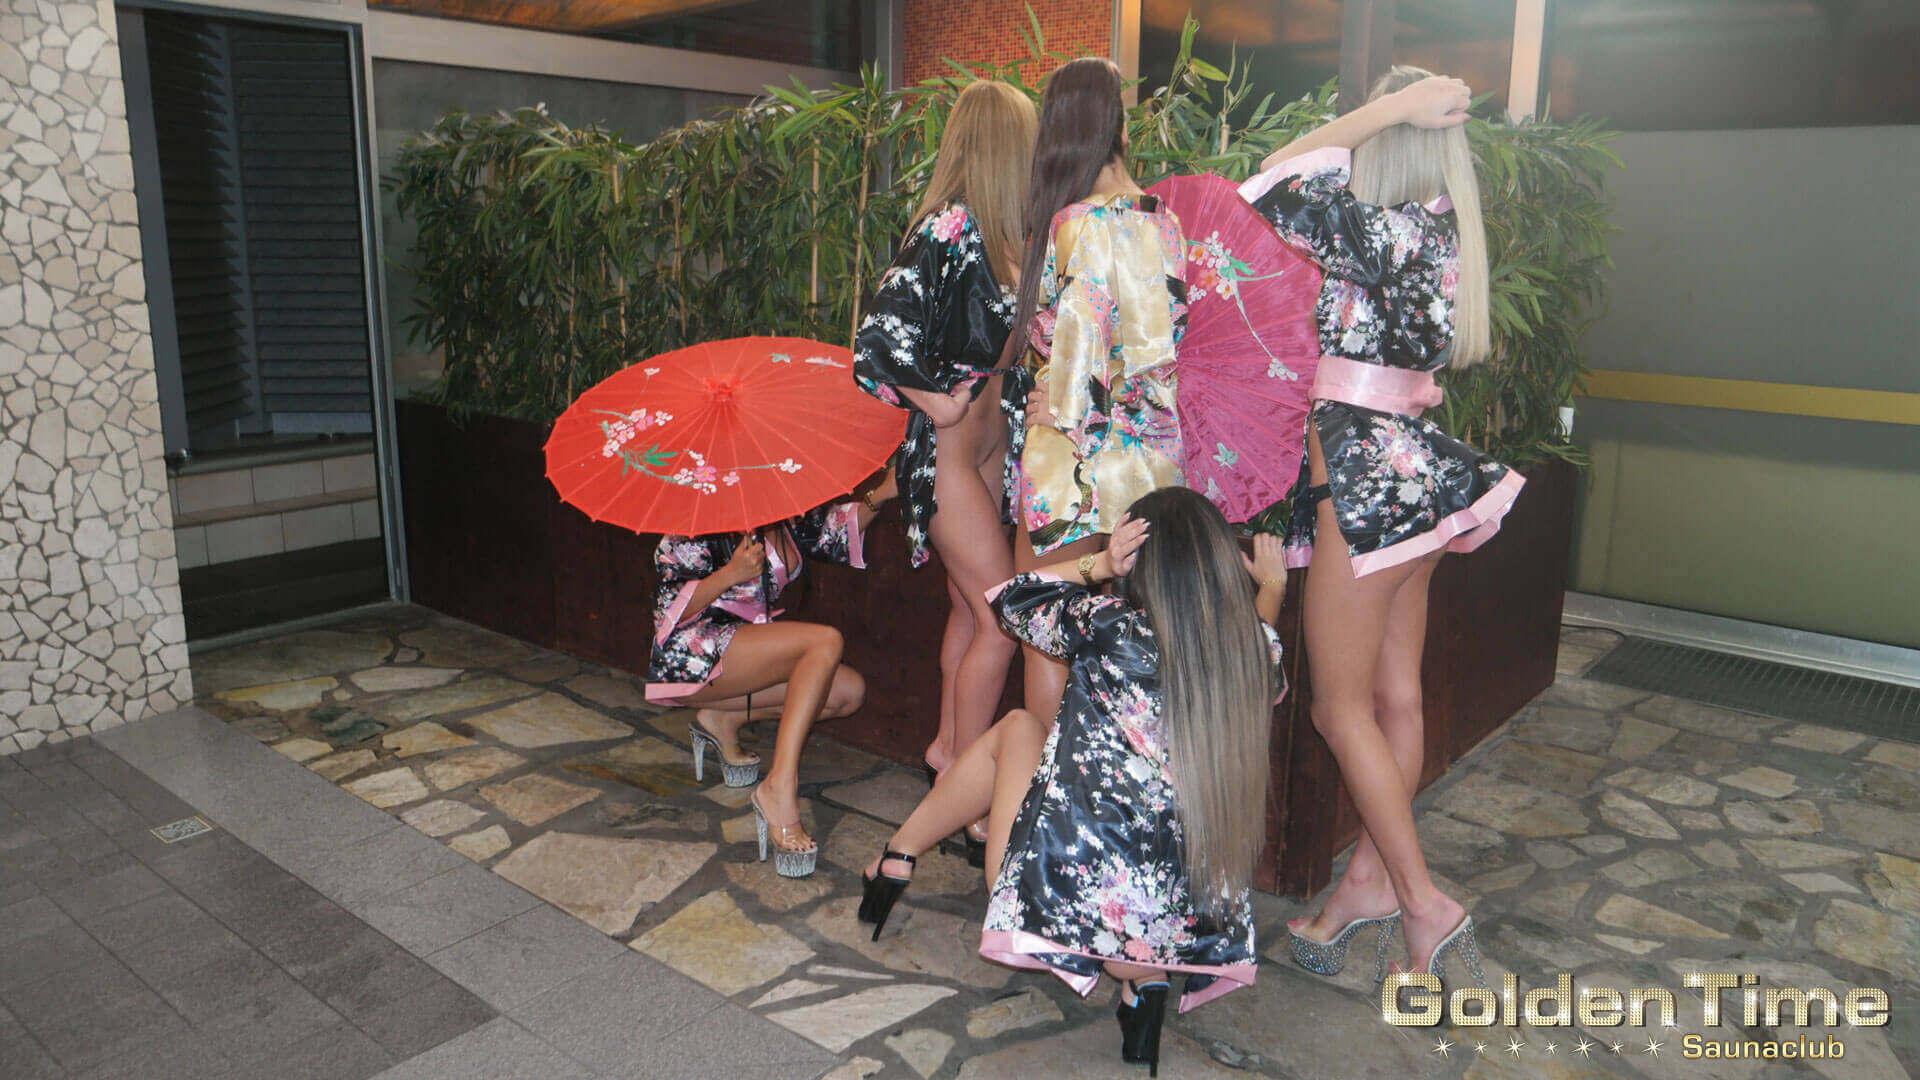 Fkk Party Nrw